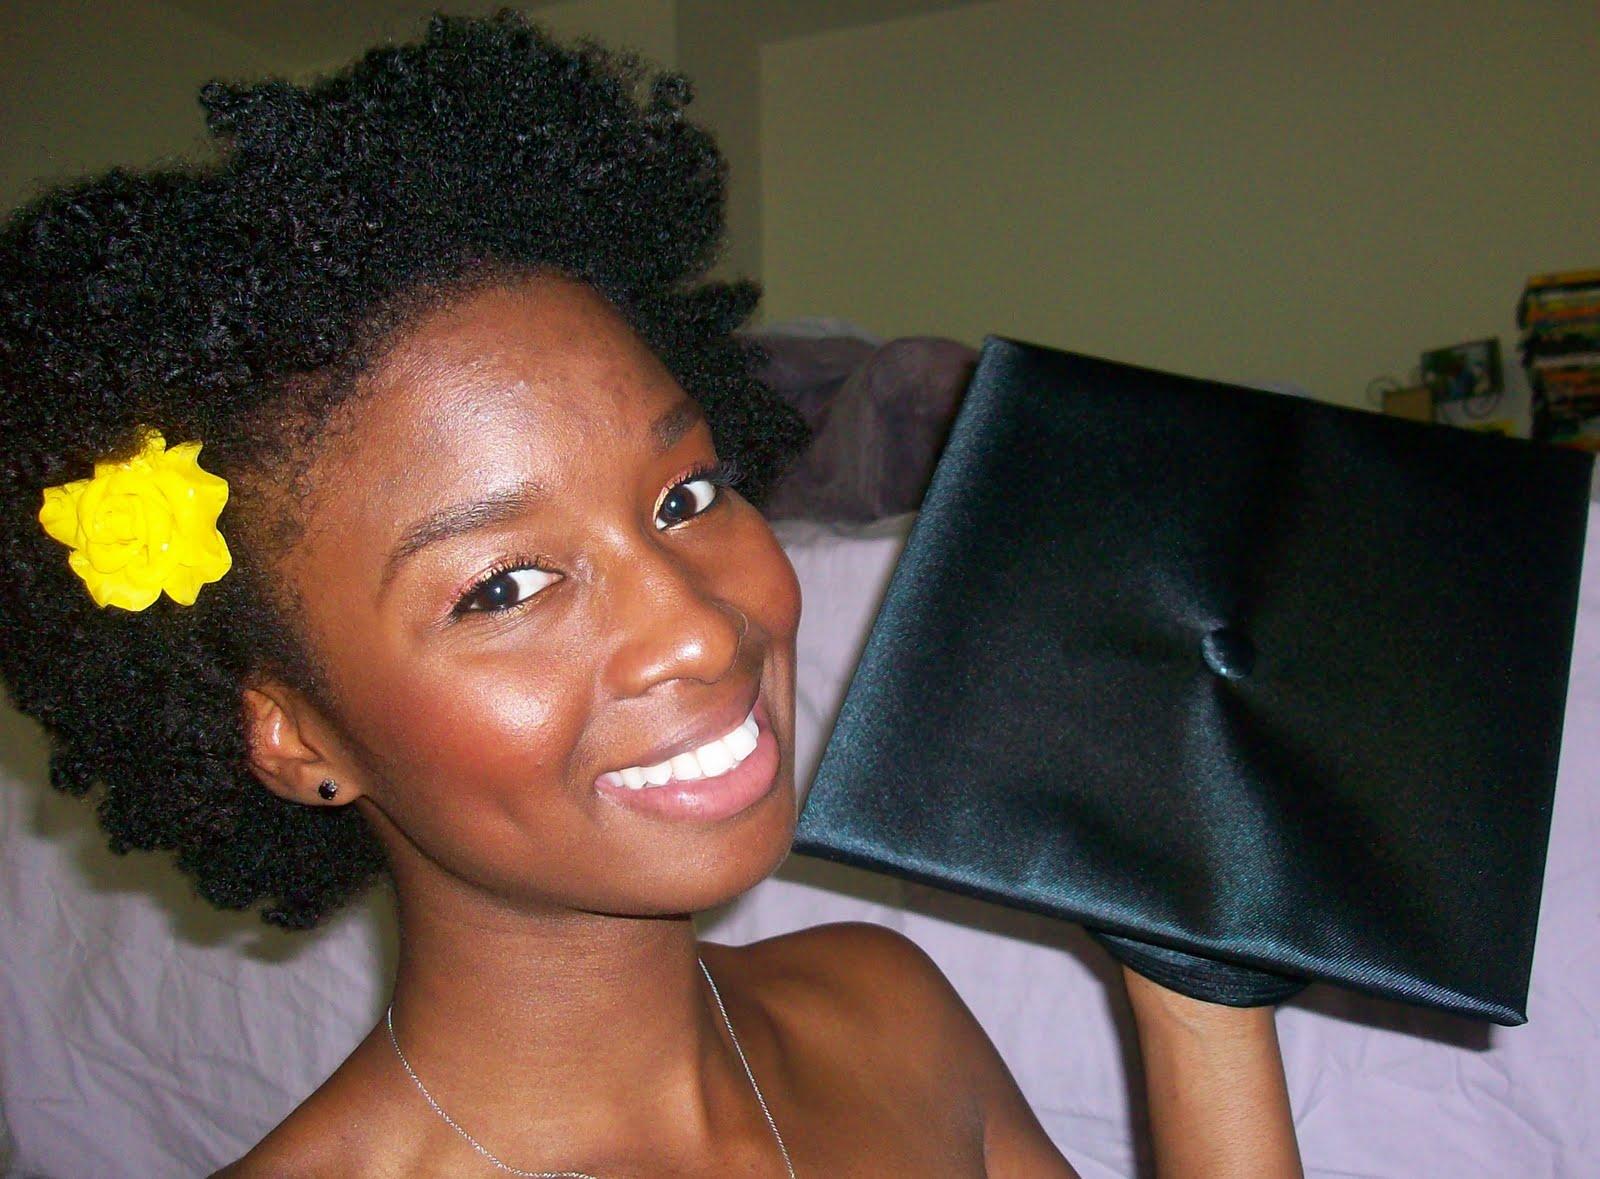 Astonishing Natural Hair And Graduation Caps Natural Hair Care Curly Nikki Short Hairstyles For Black Women Fulllsitofus